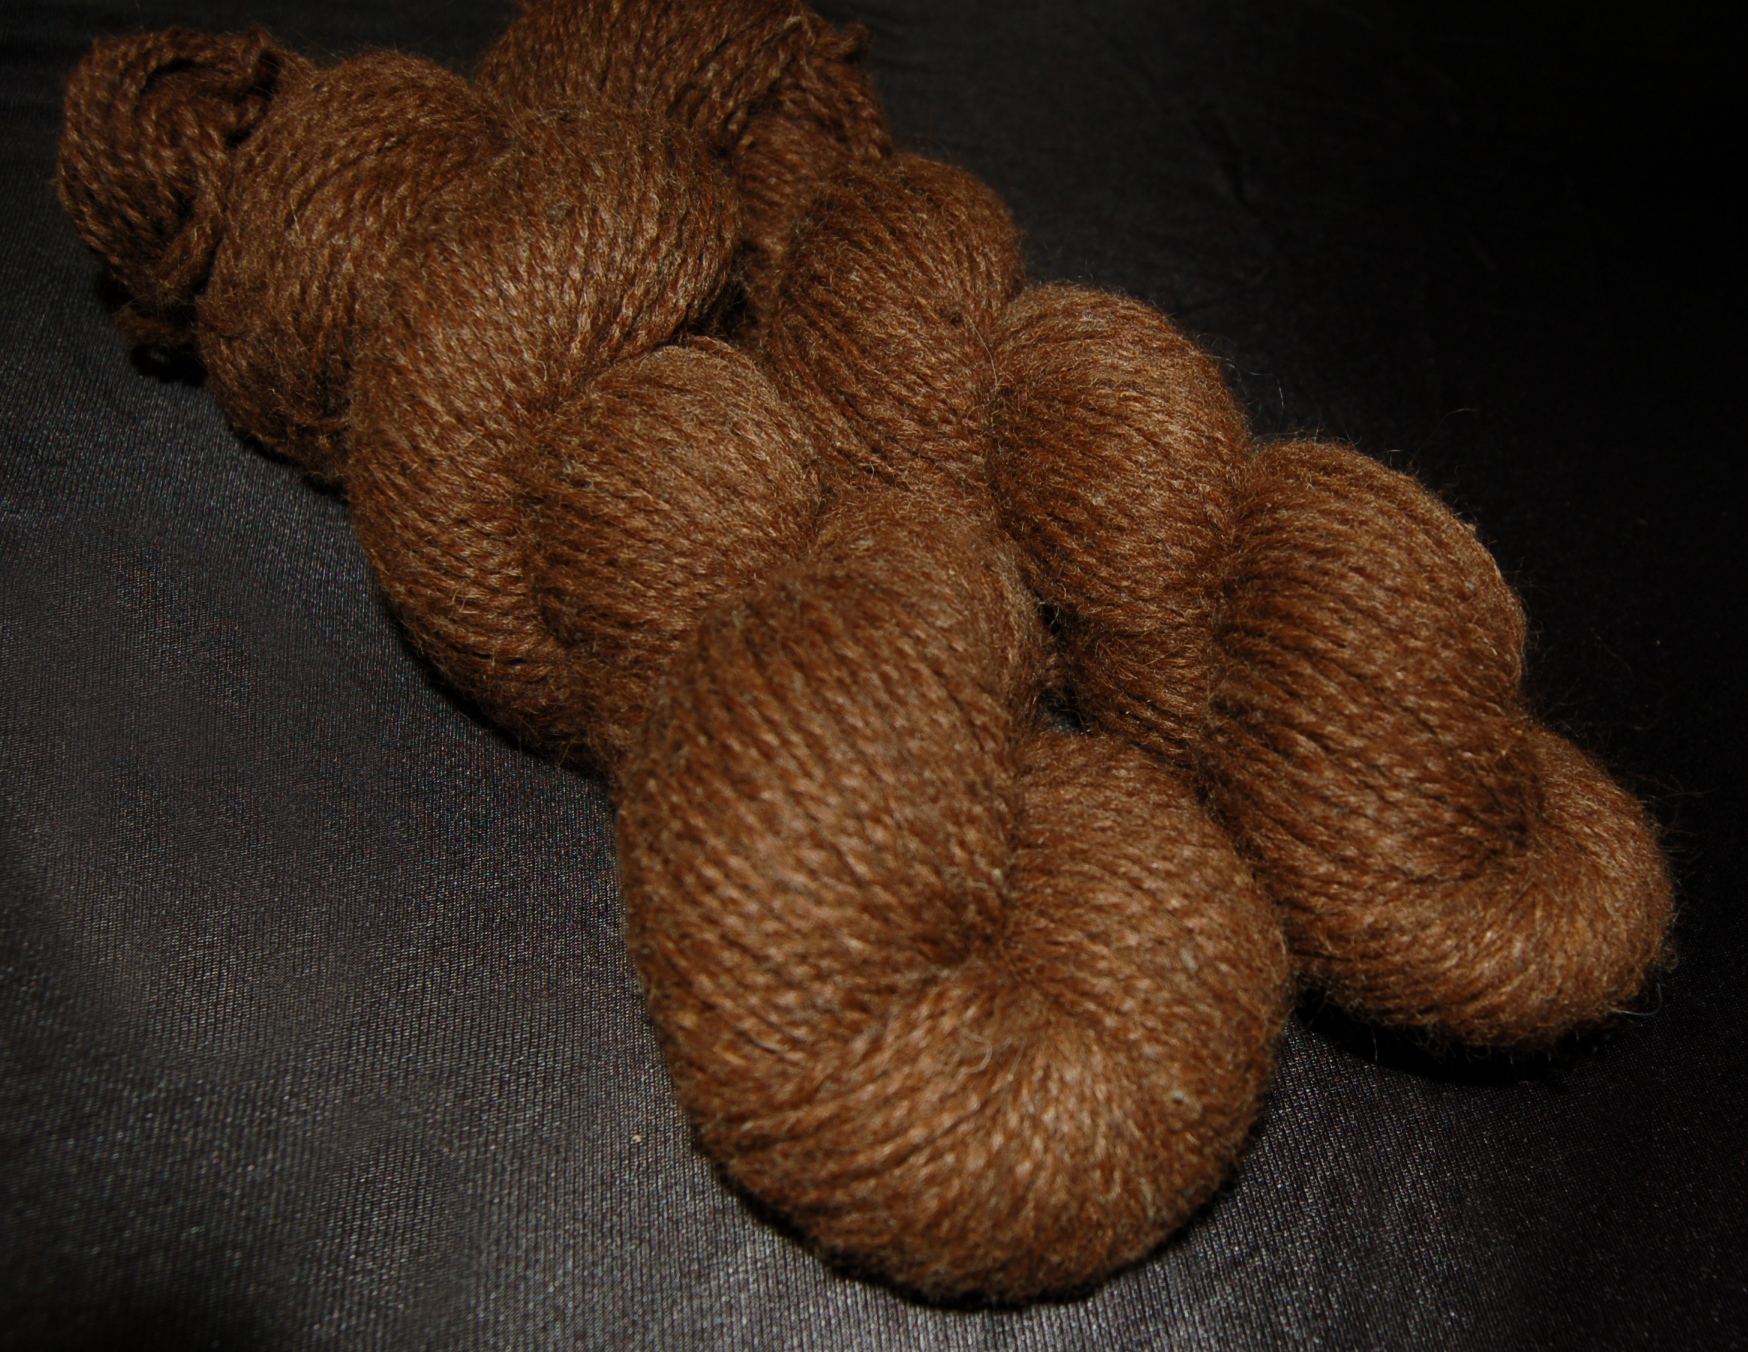 brown-yarn-may15rt.jpg